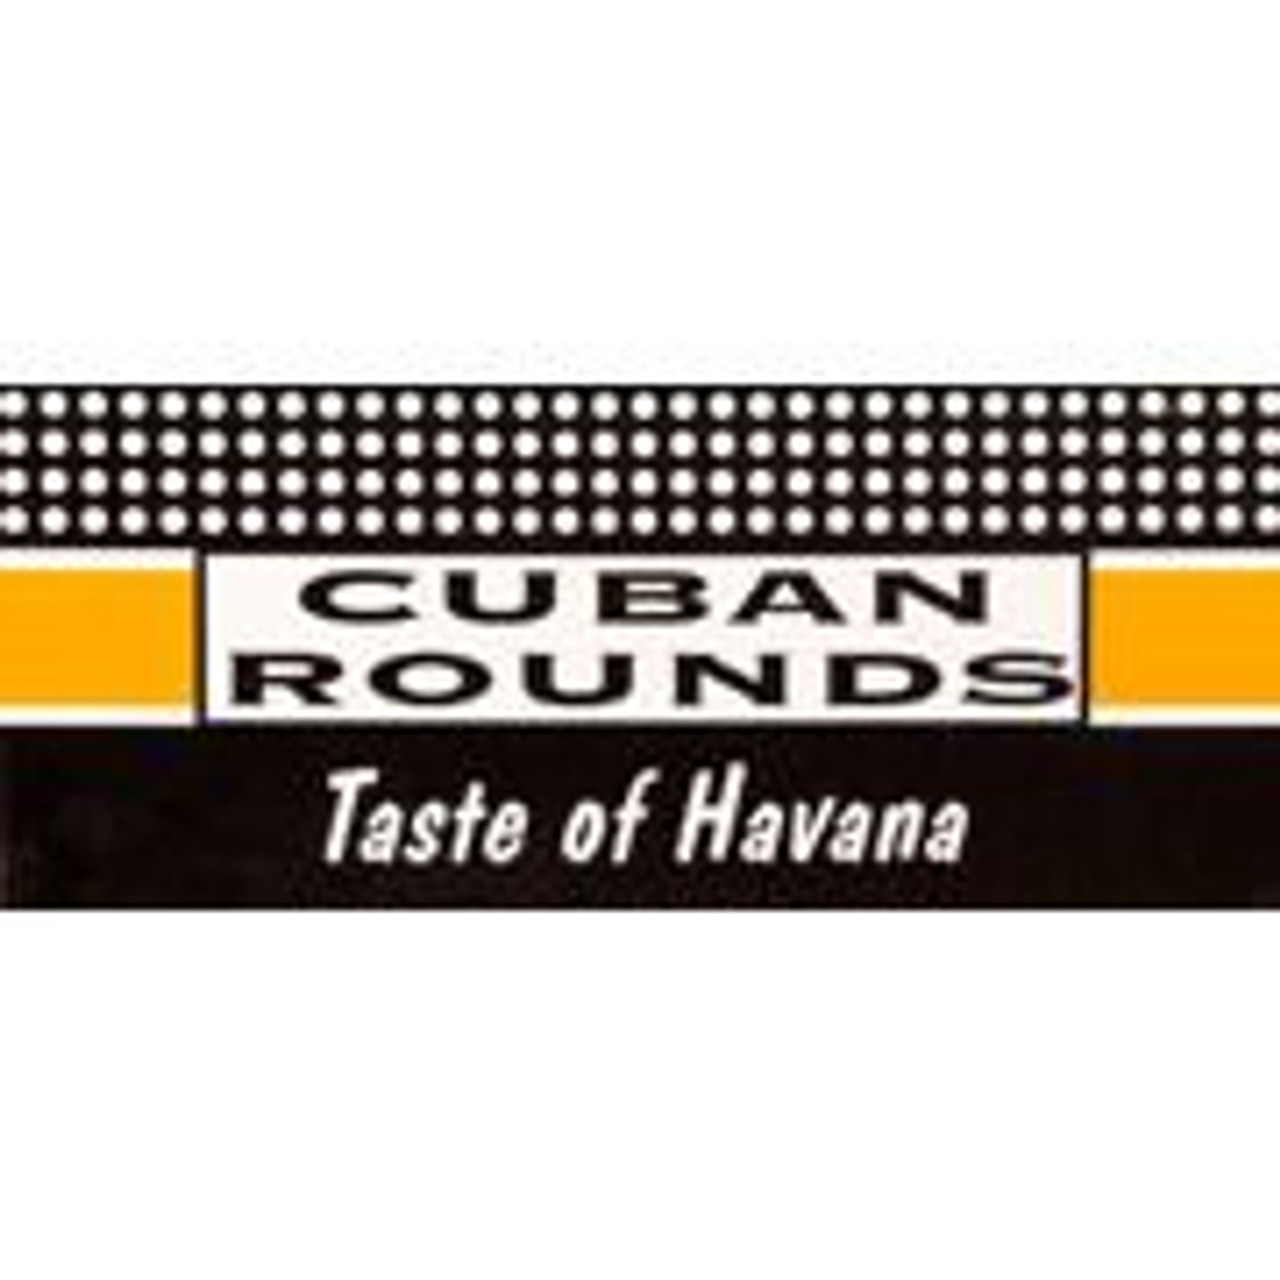 Cuban Rounds Toro Cigars - 6.0 x 50 (Bundle of 20)